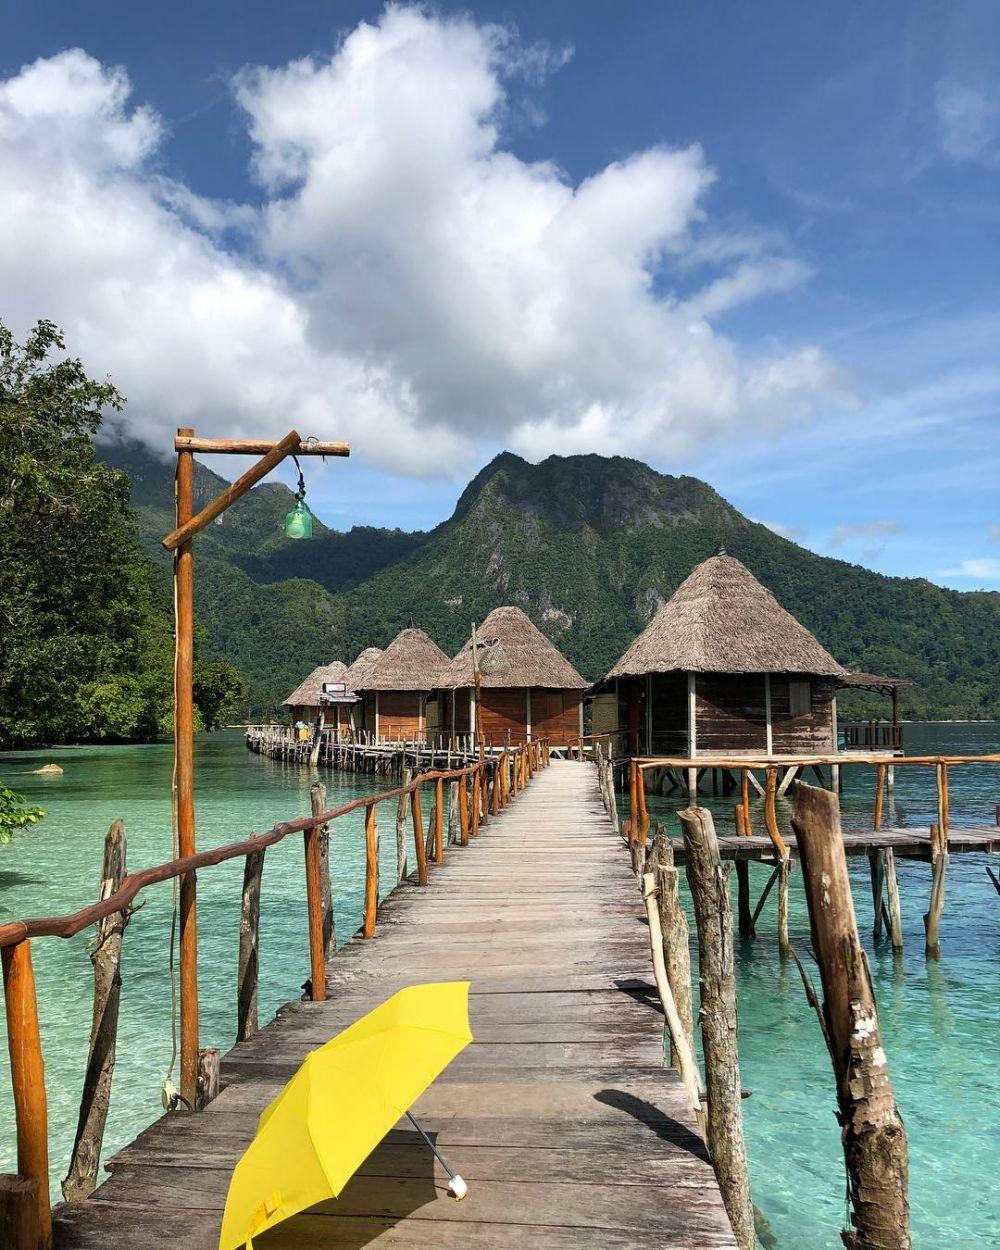 9 Tempat honeymoon romantis di Indonesia, bikin makin mesra